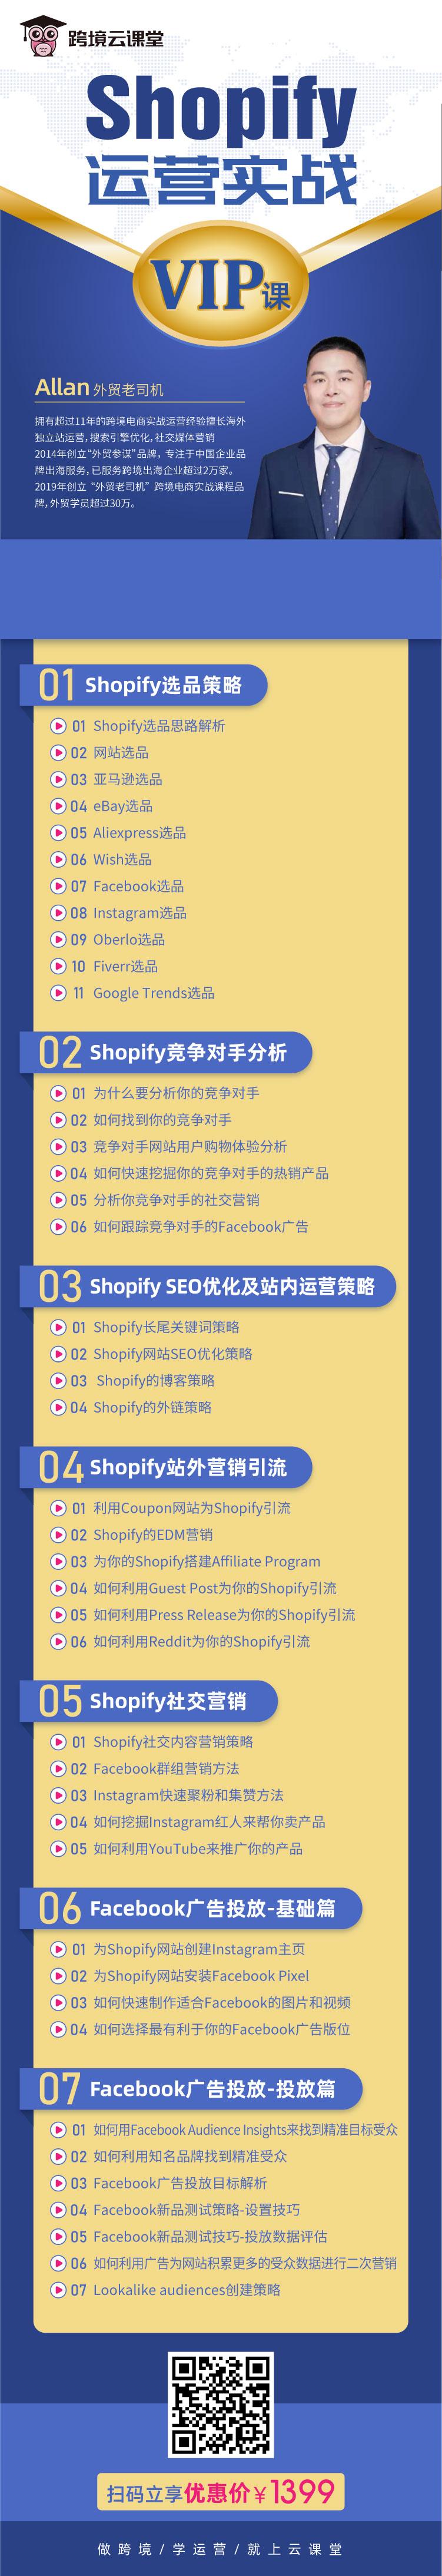 VIP长海报网站.jpg